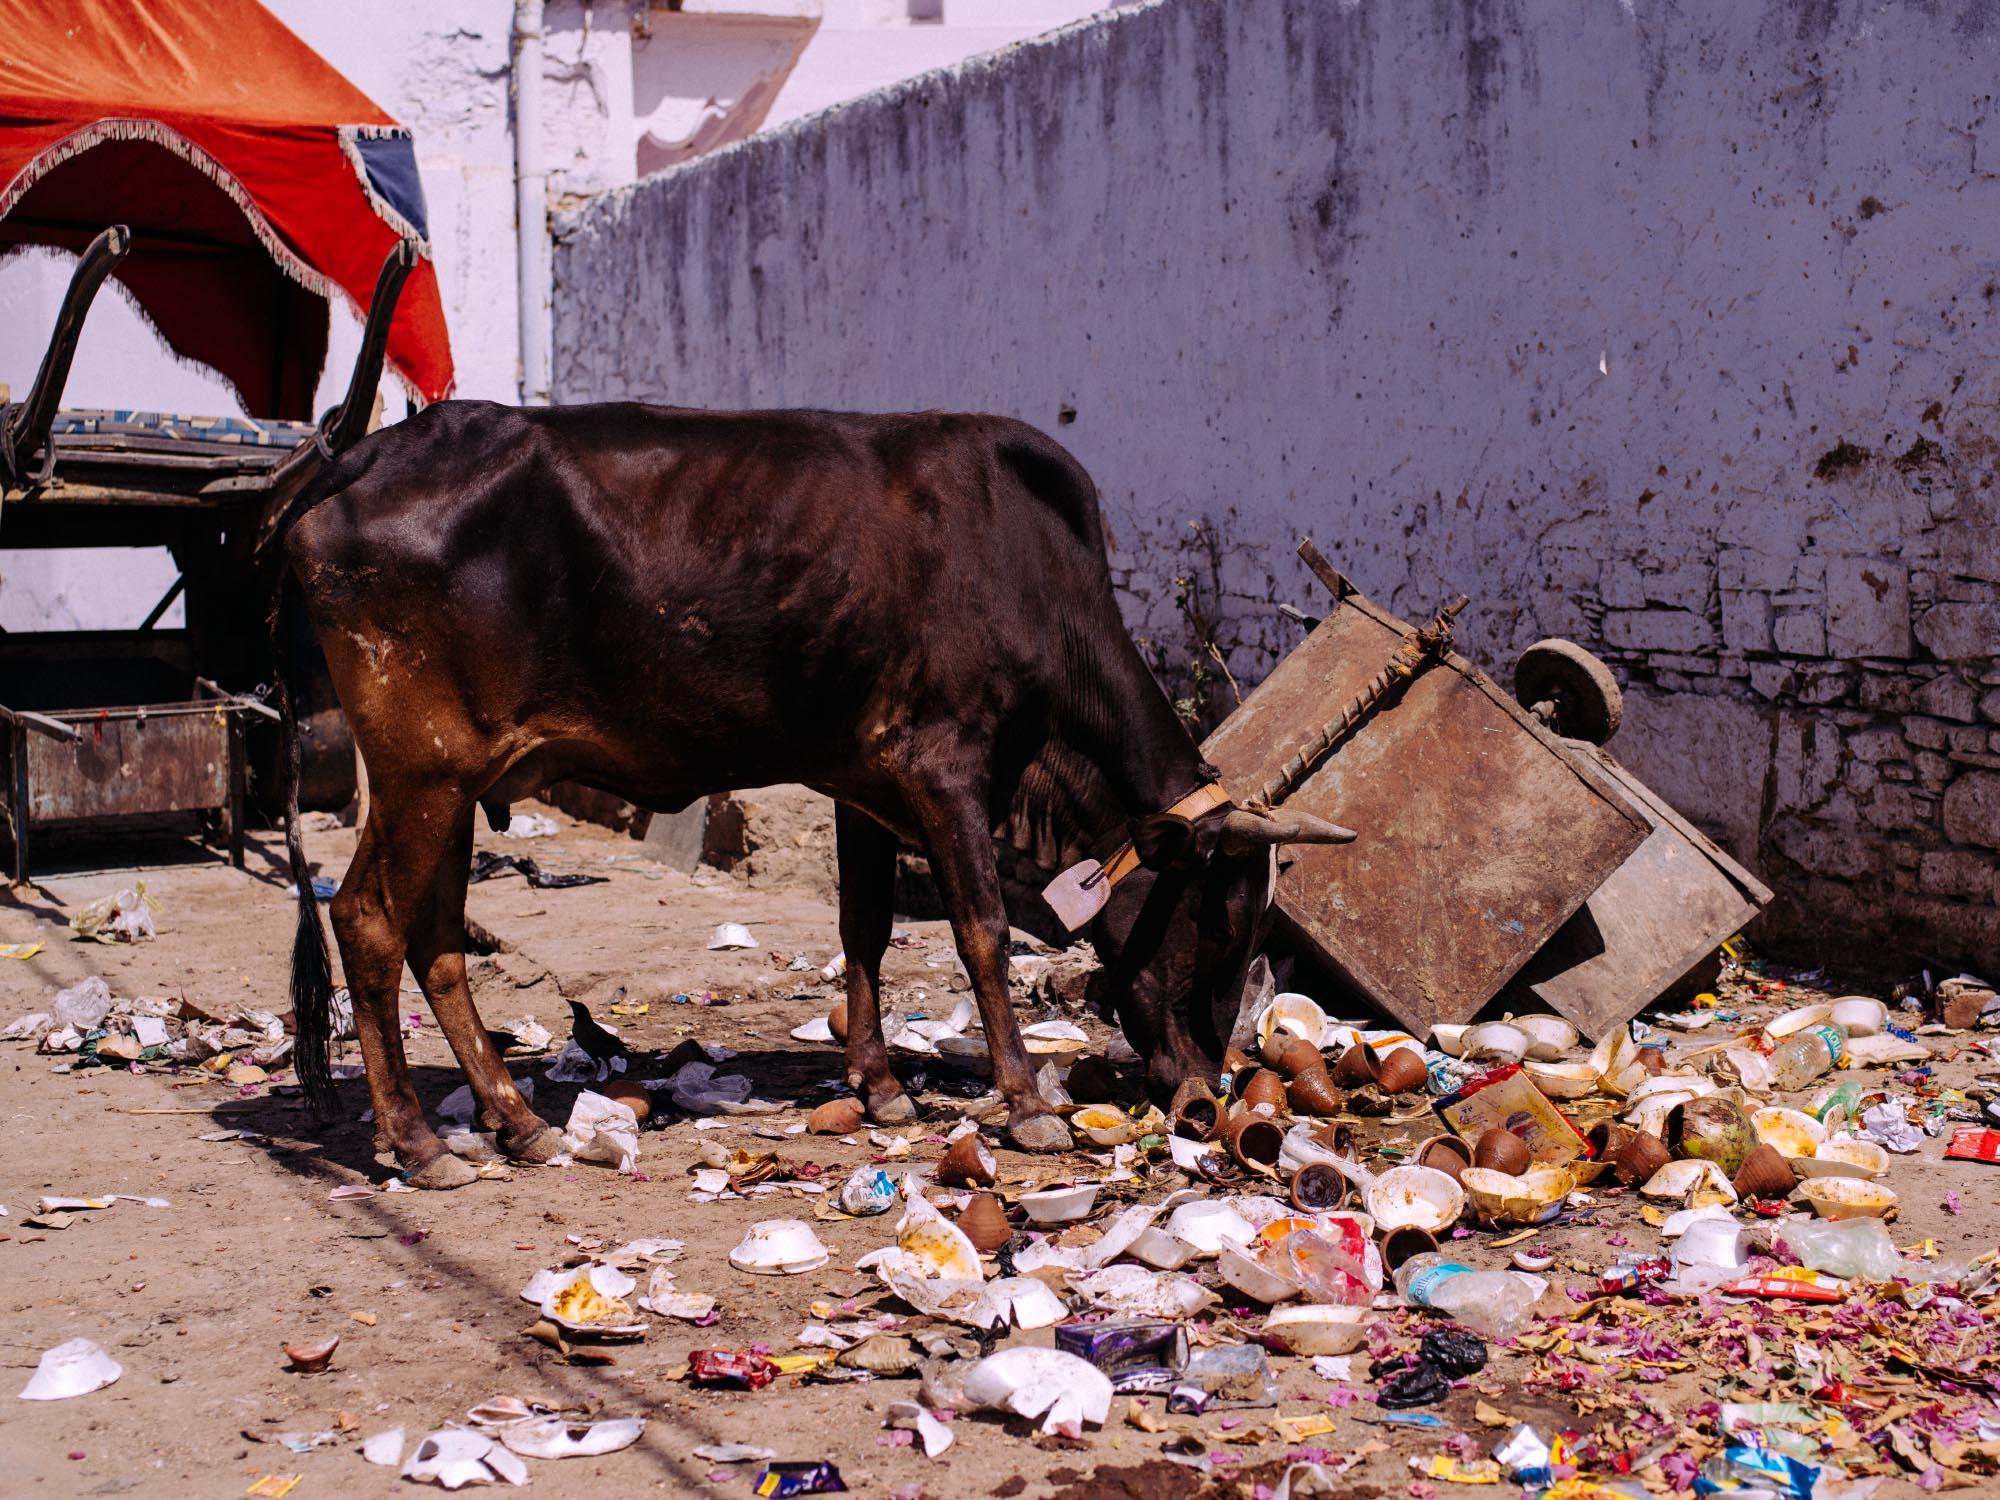 Poor cows end up eating trash.